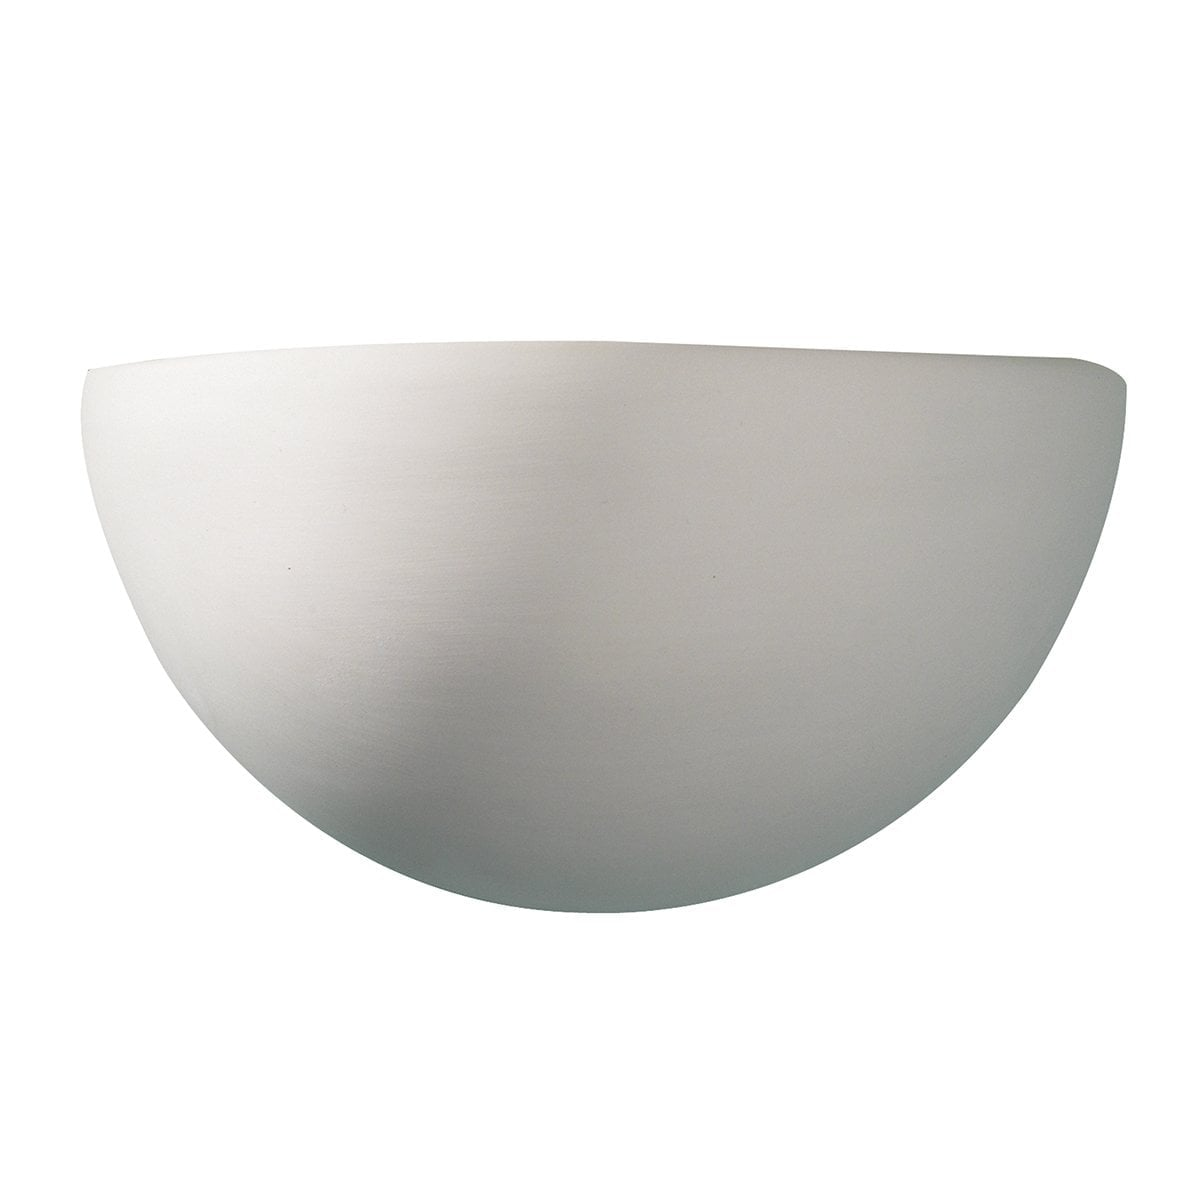 Dar MAR0748 Marino 1lt, White